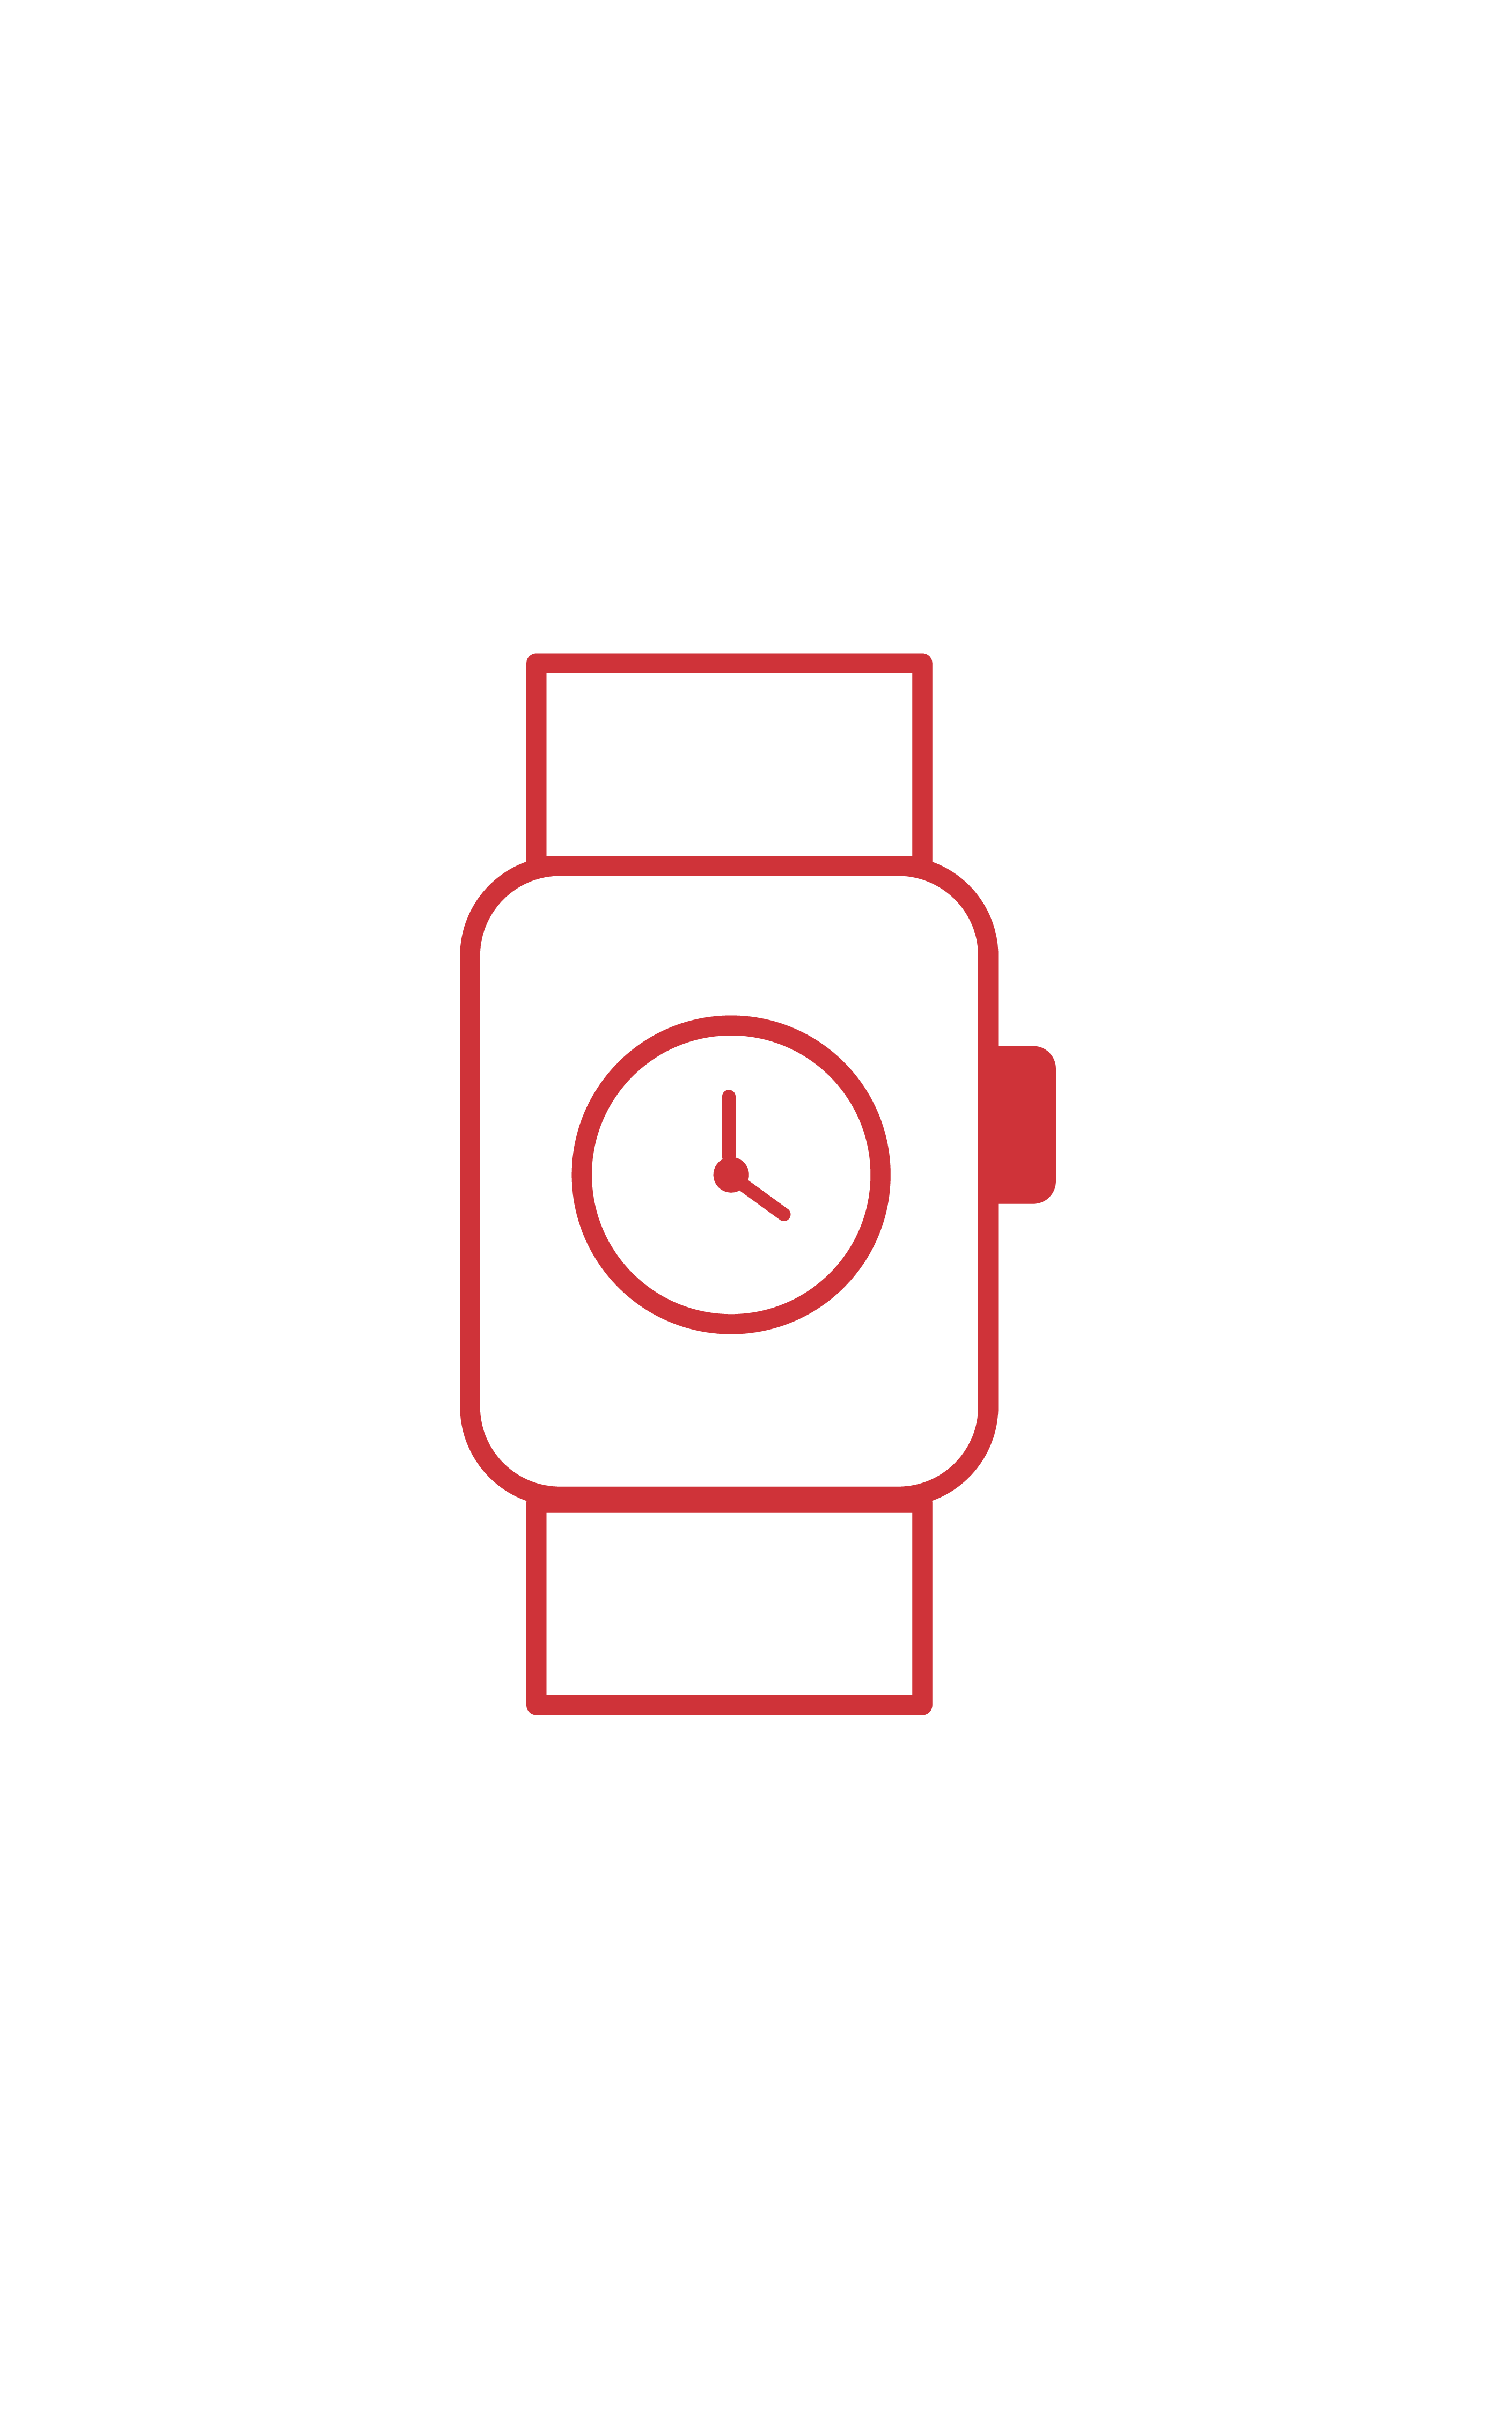 What_Time_Should_I_Login